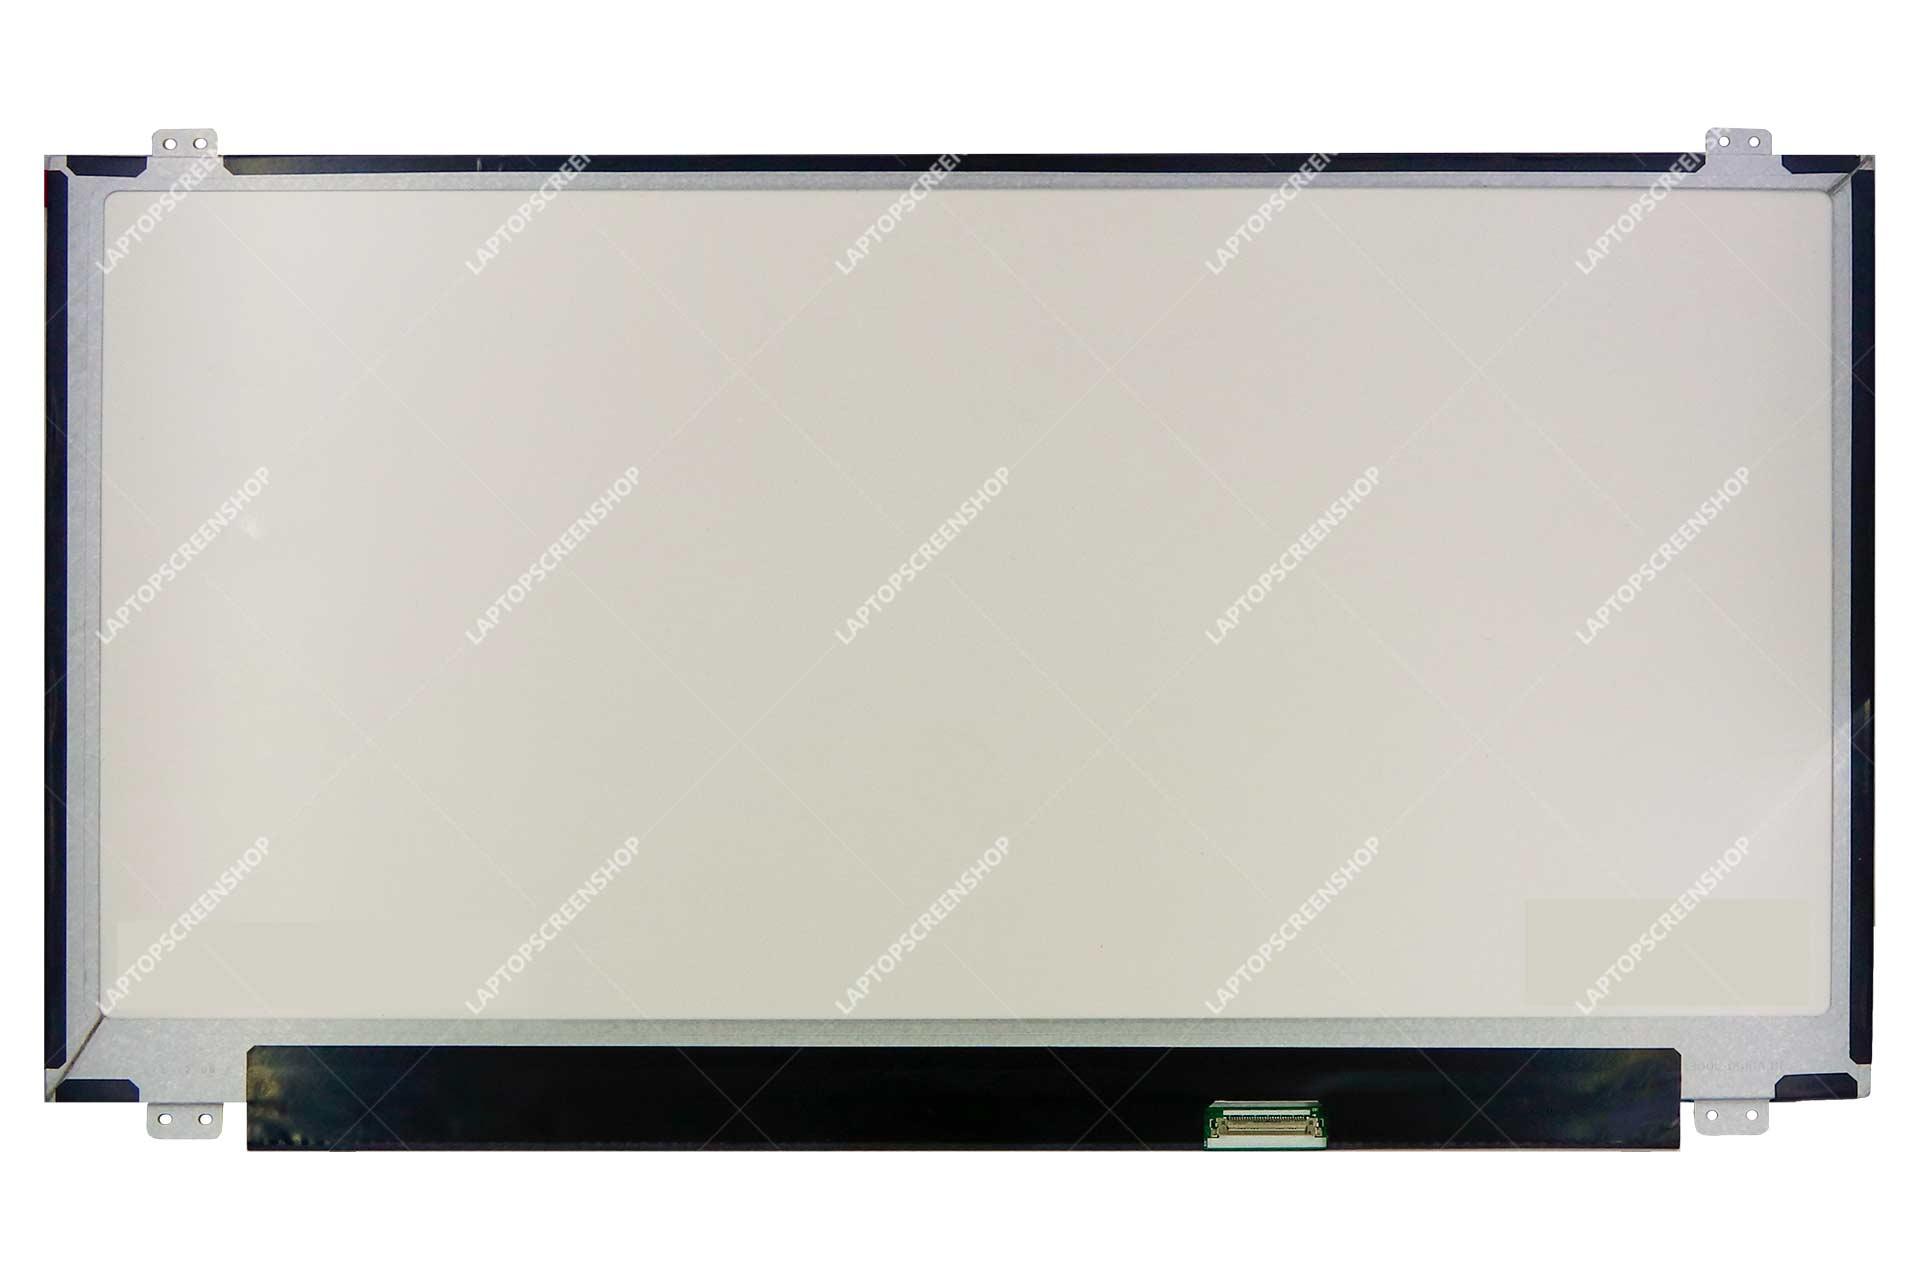 ACER-ASPIRE-E1-510-4899-LCD |HD|فروشگاه لپ تاپ اسکرين | تعمير لپ تاپ